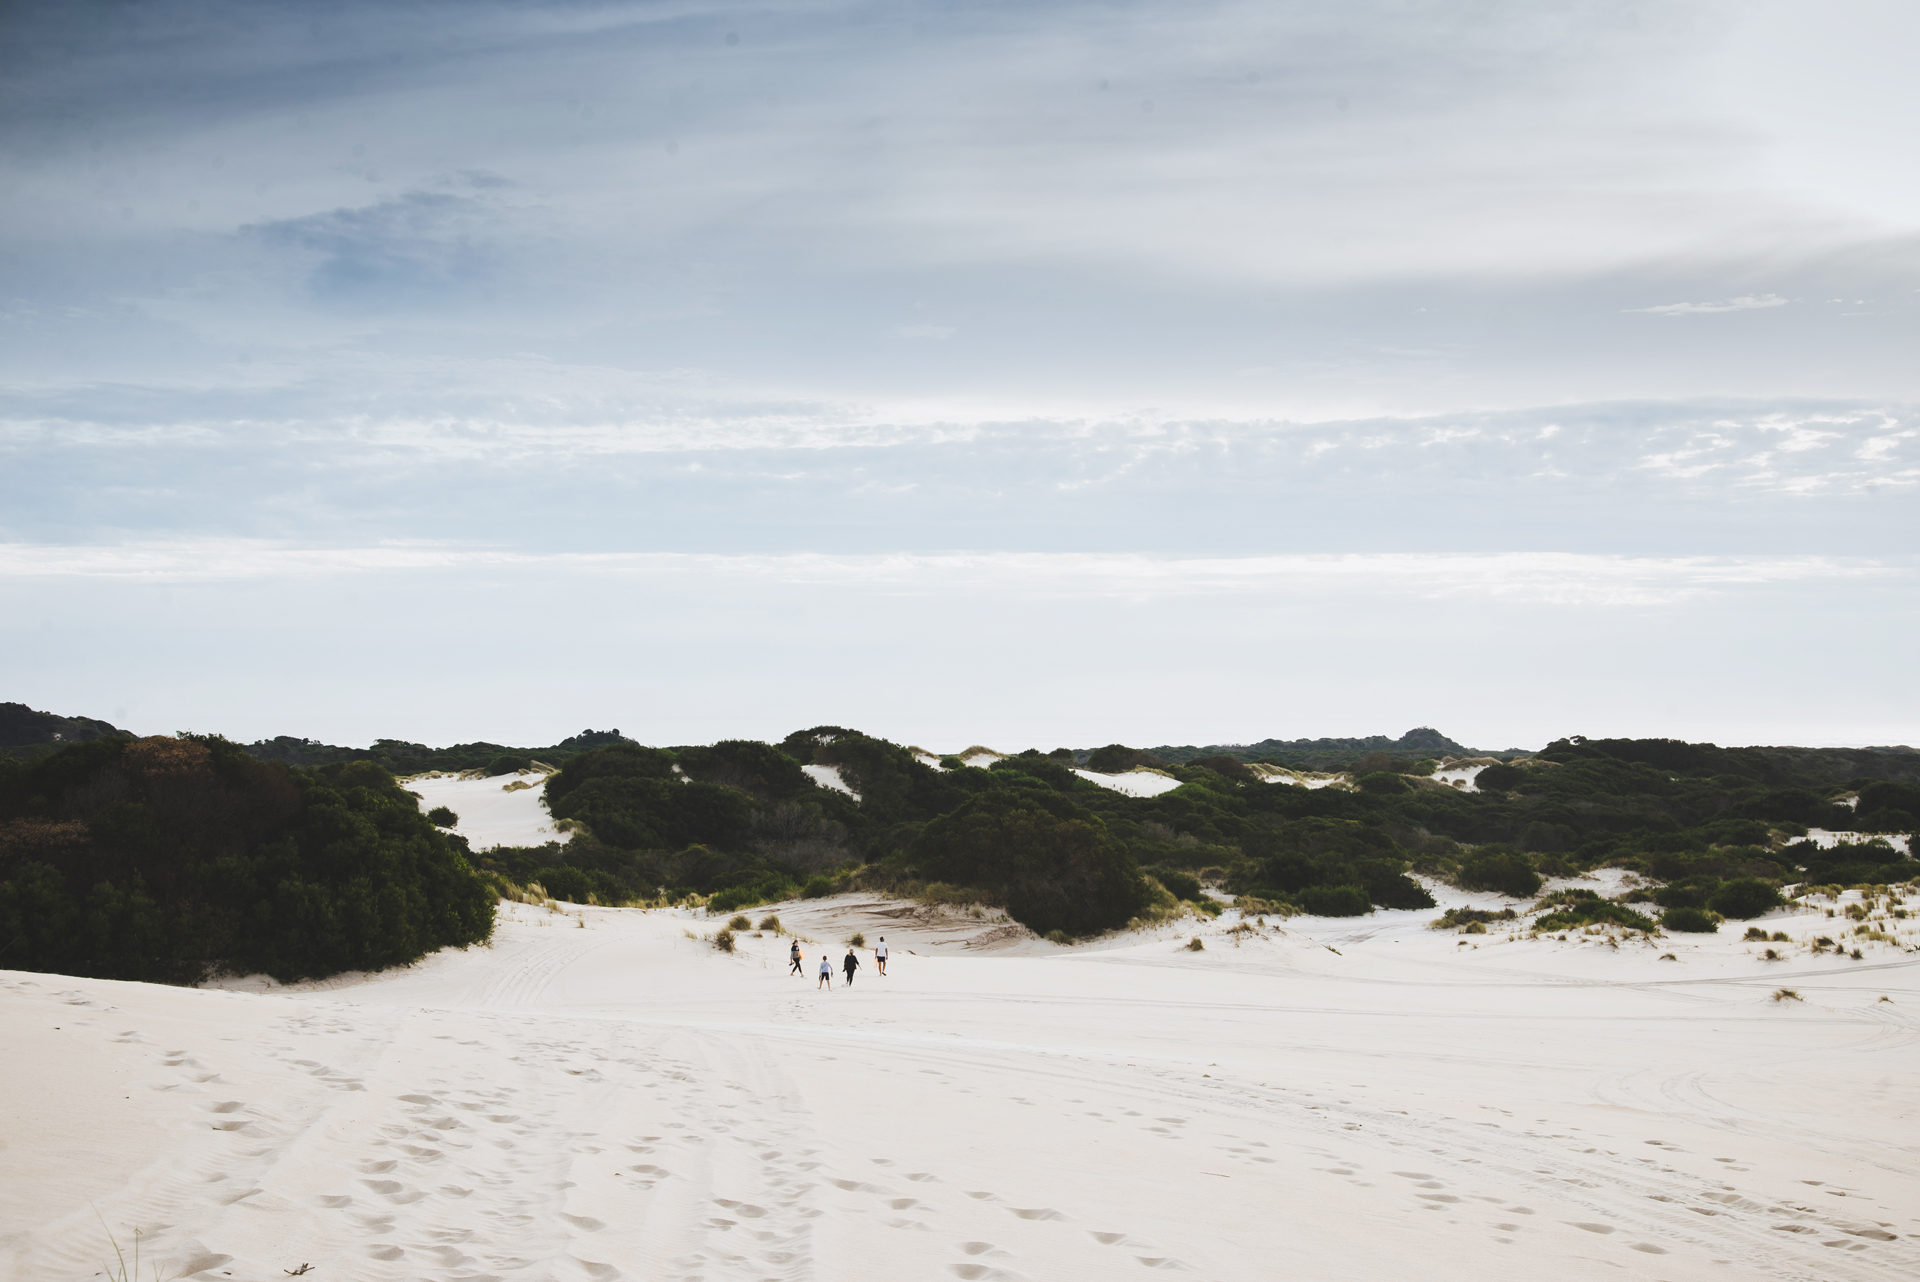 tasmania wydmy